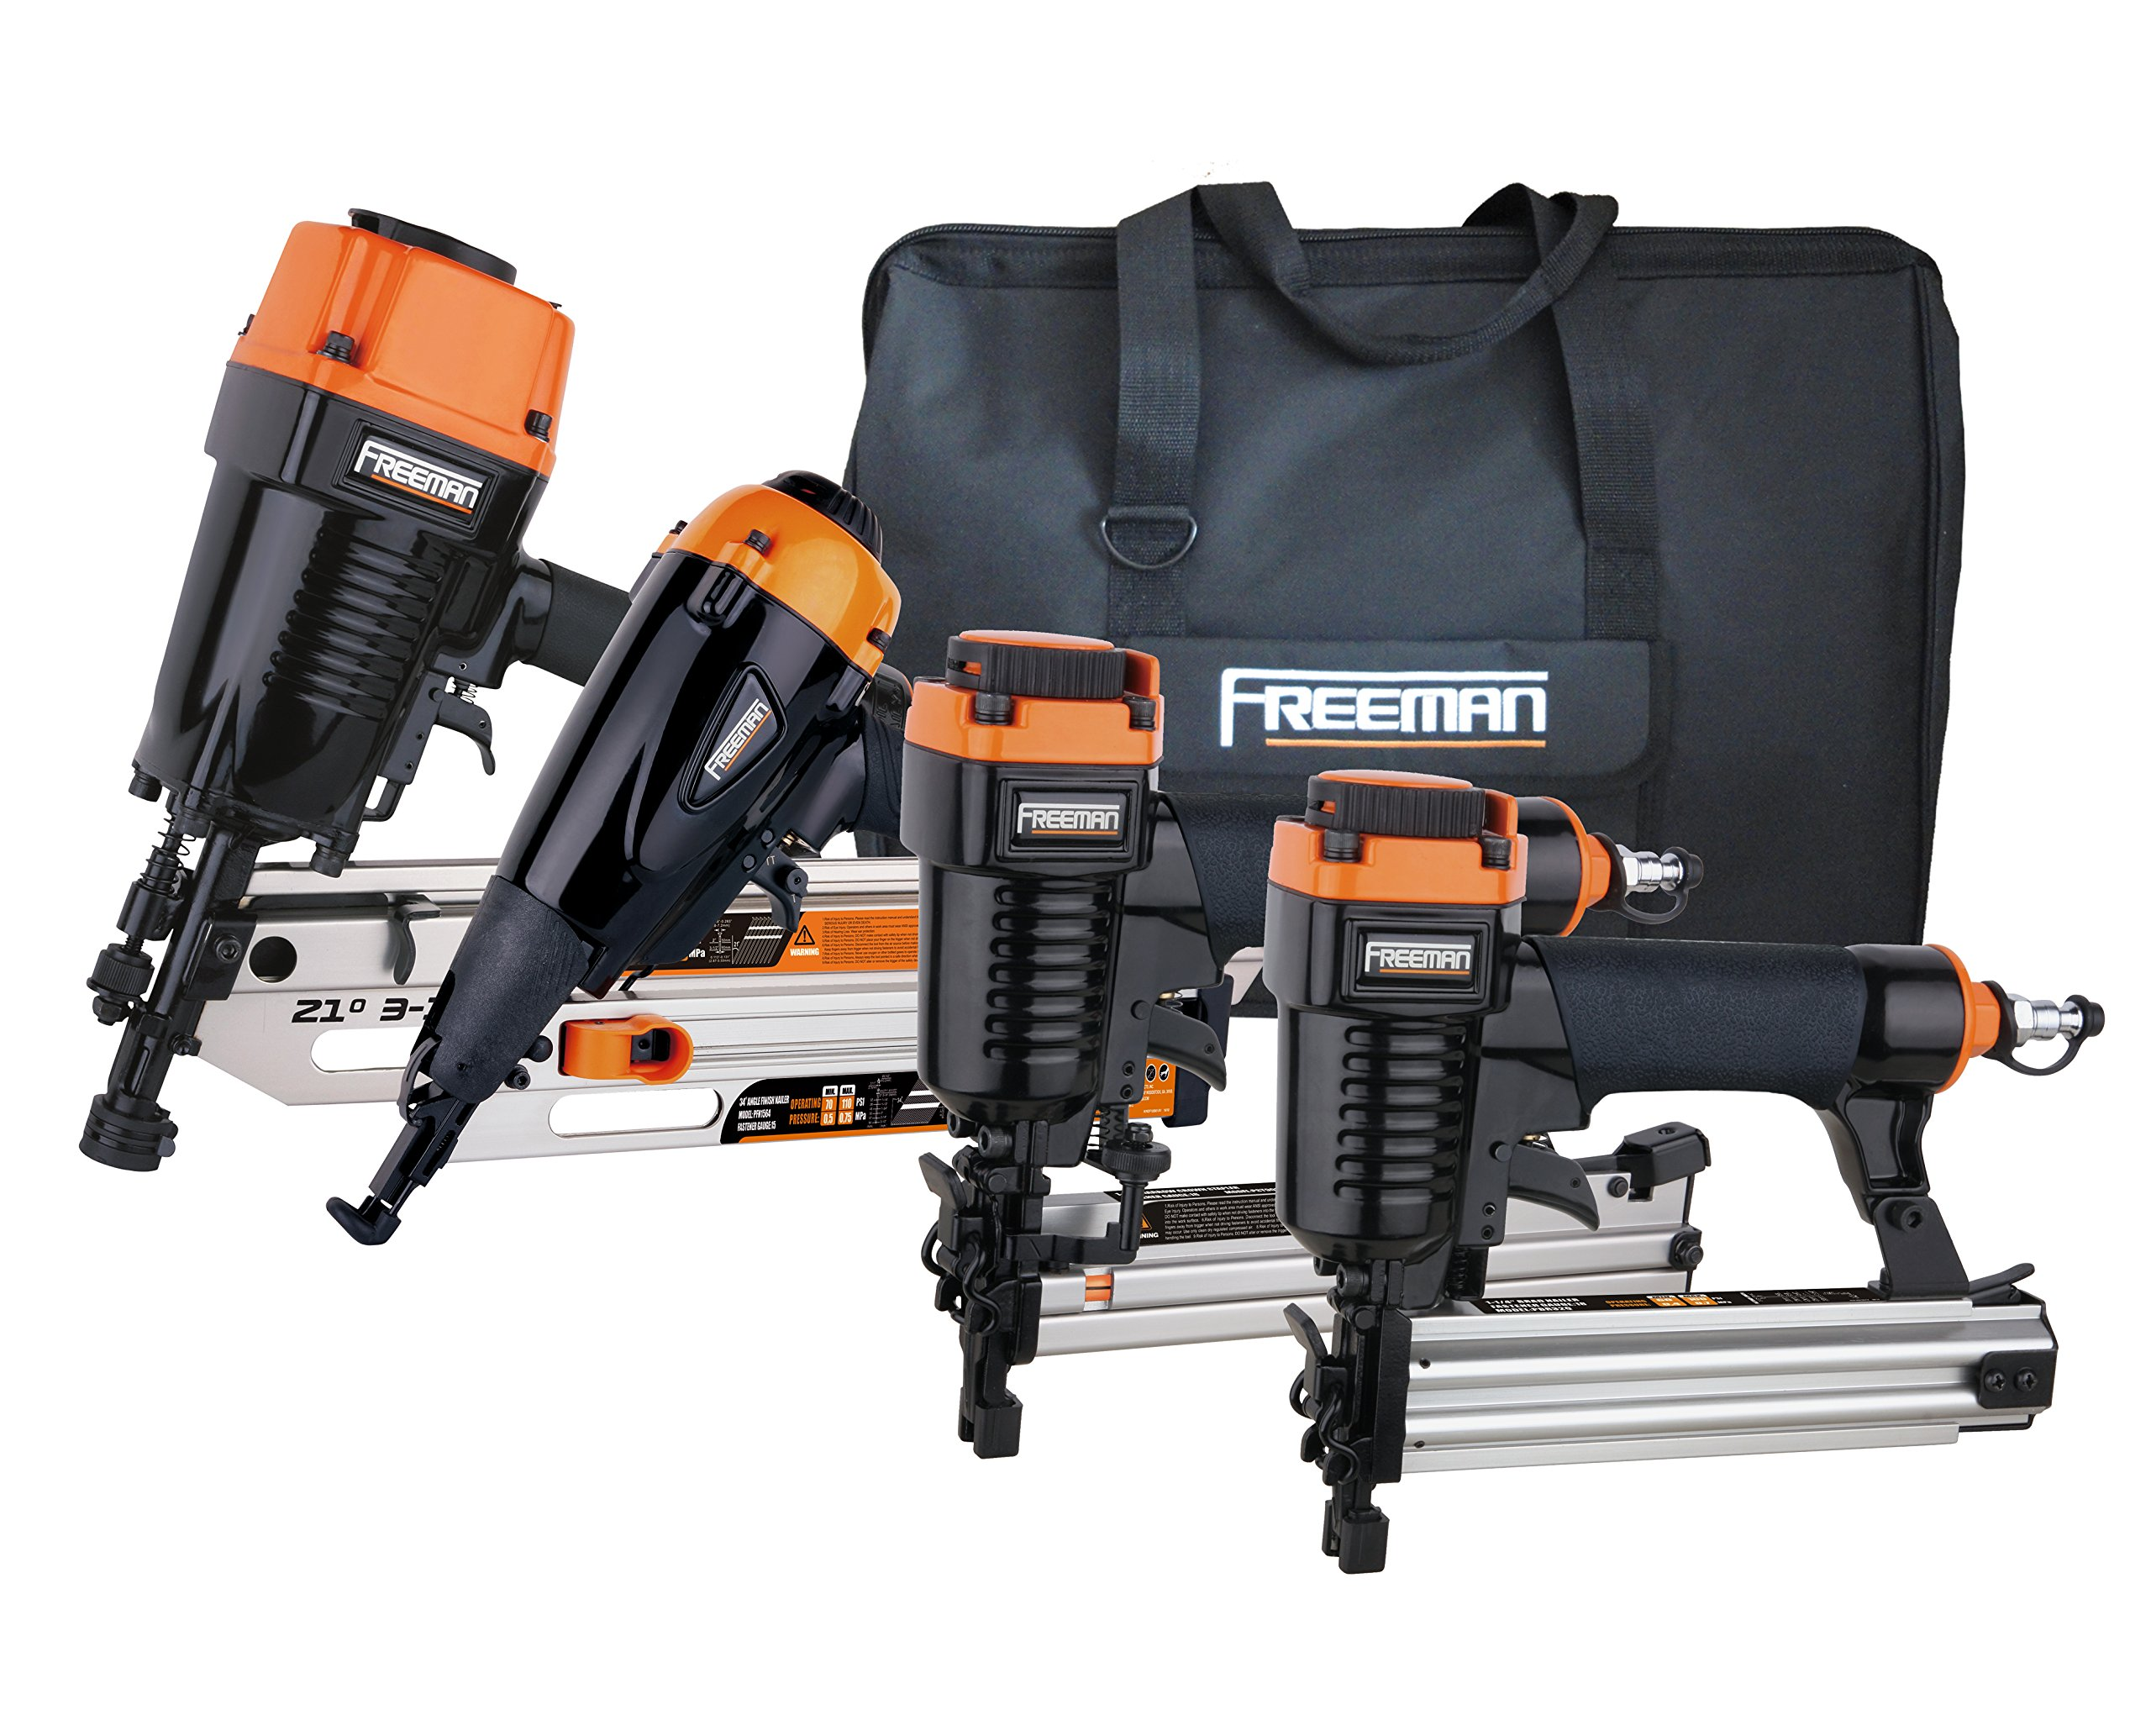 Freeman P4FRFNCB Pneumatic Framing & Finishing Combo Kit with Canvas Bag (4Piece) Nail Gun Set with Framing Nailer, Finish Nailer, Brad Nailer, & Narrow Crown Stapler by Freeman